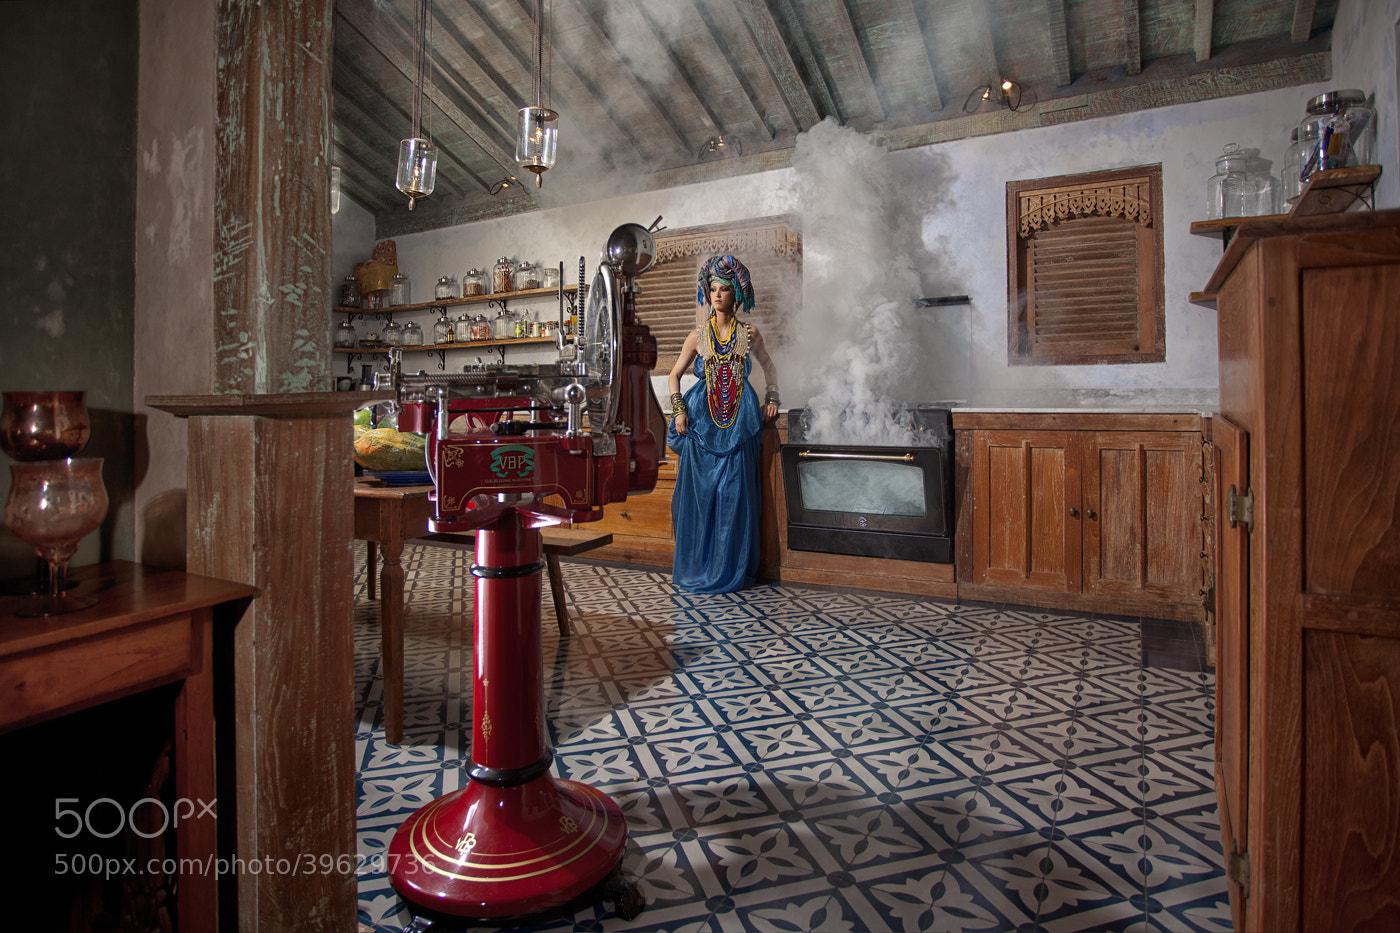 Photograph Ethnic 1 by Kirill Utevsky on 500px